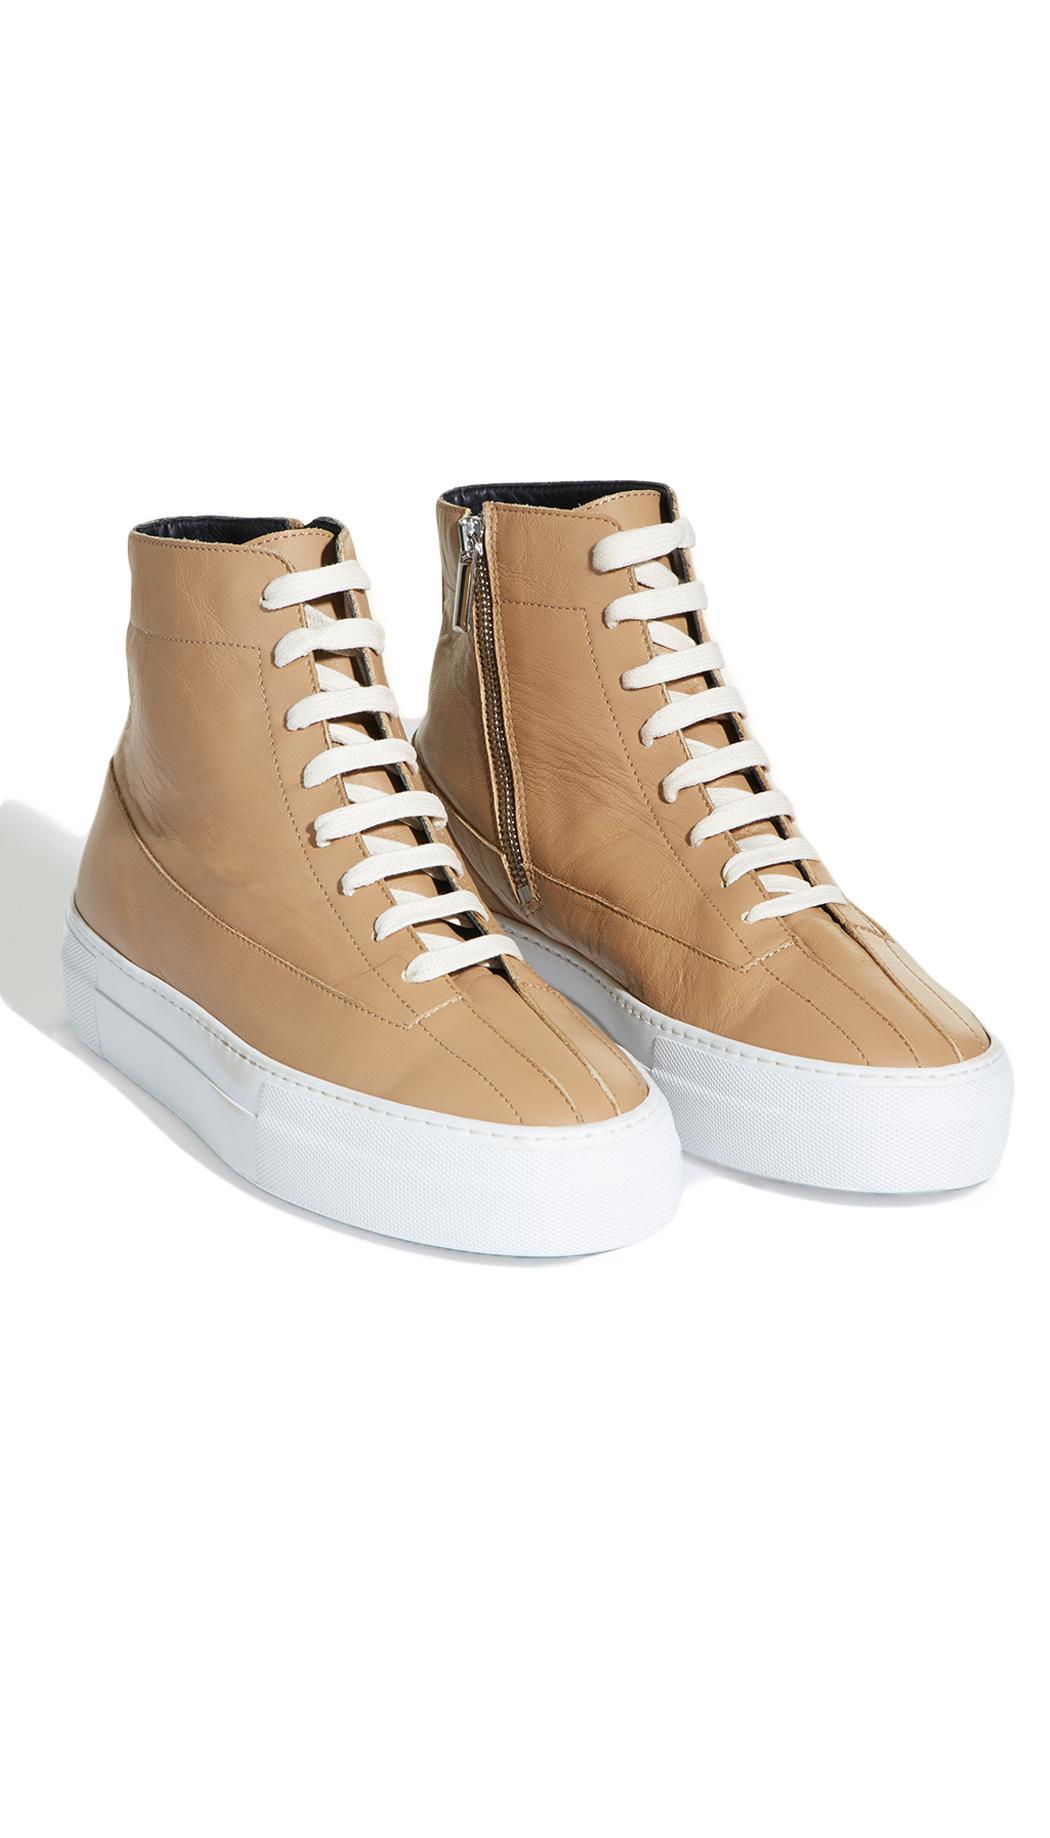 Tibi Leather Gabe Sneakers